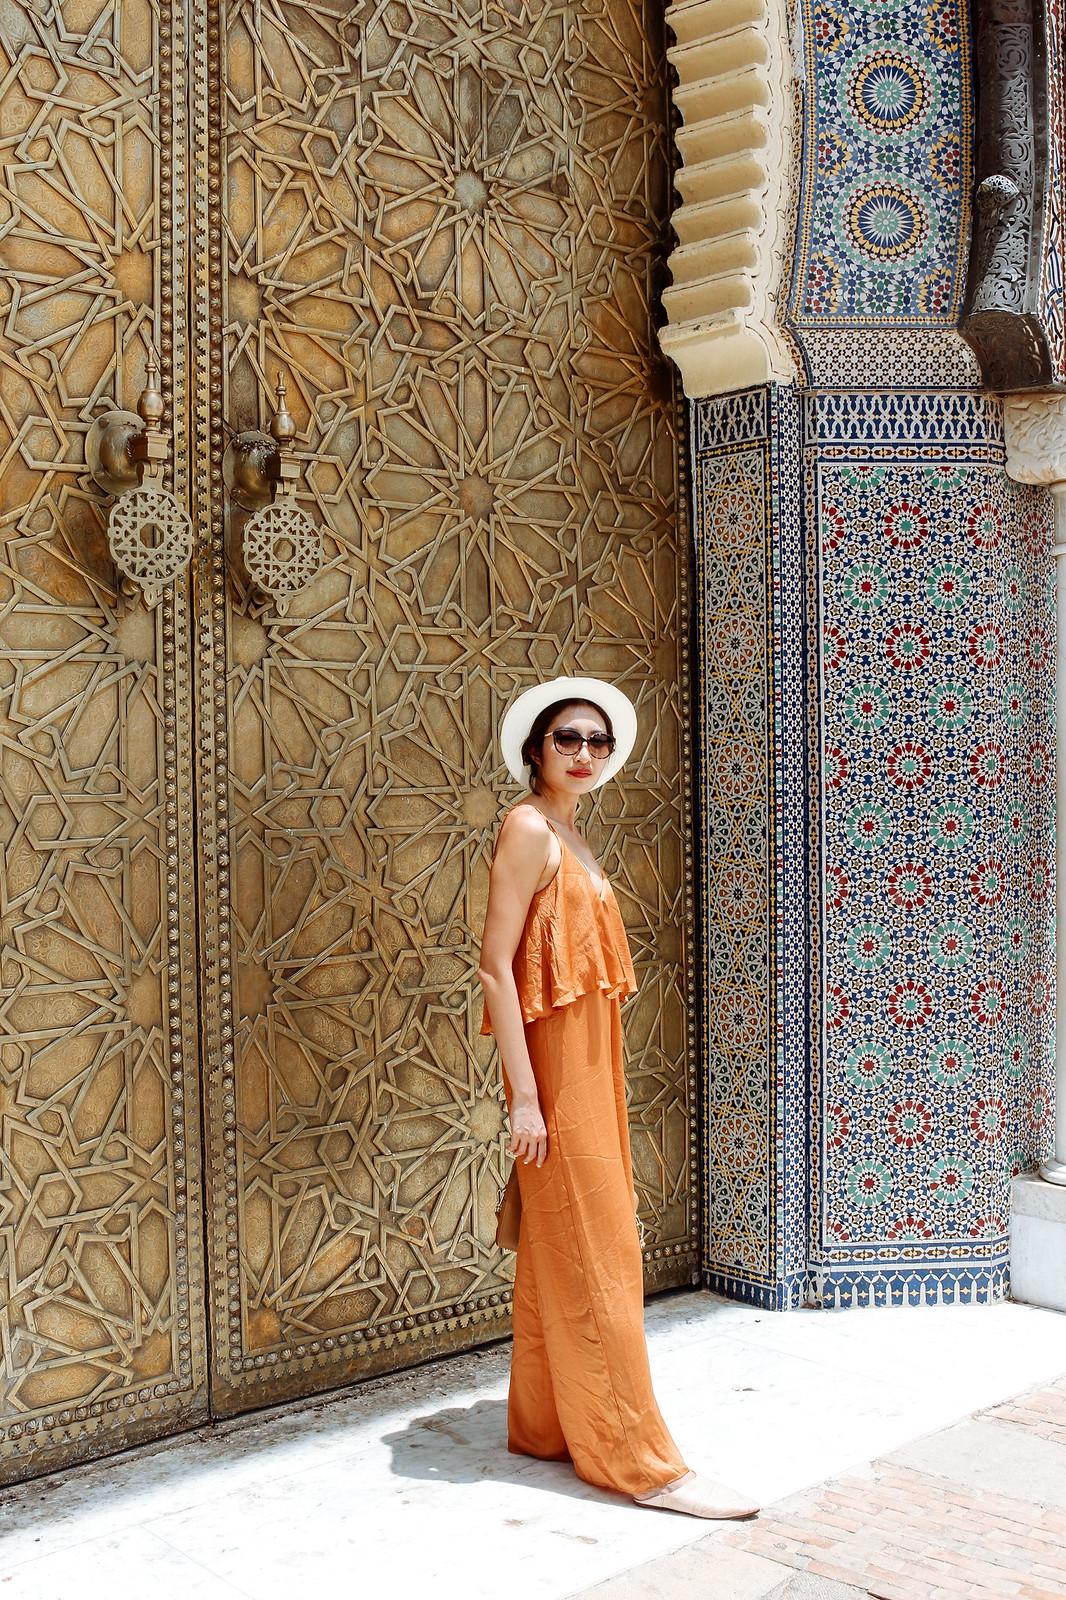 Fes Morocco - kisses,vera-63